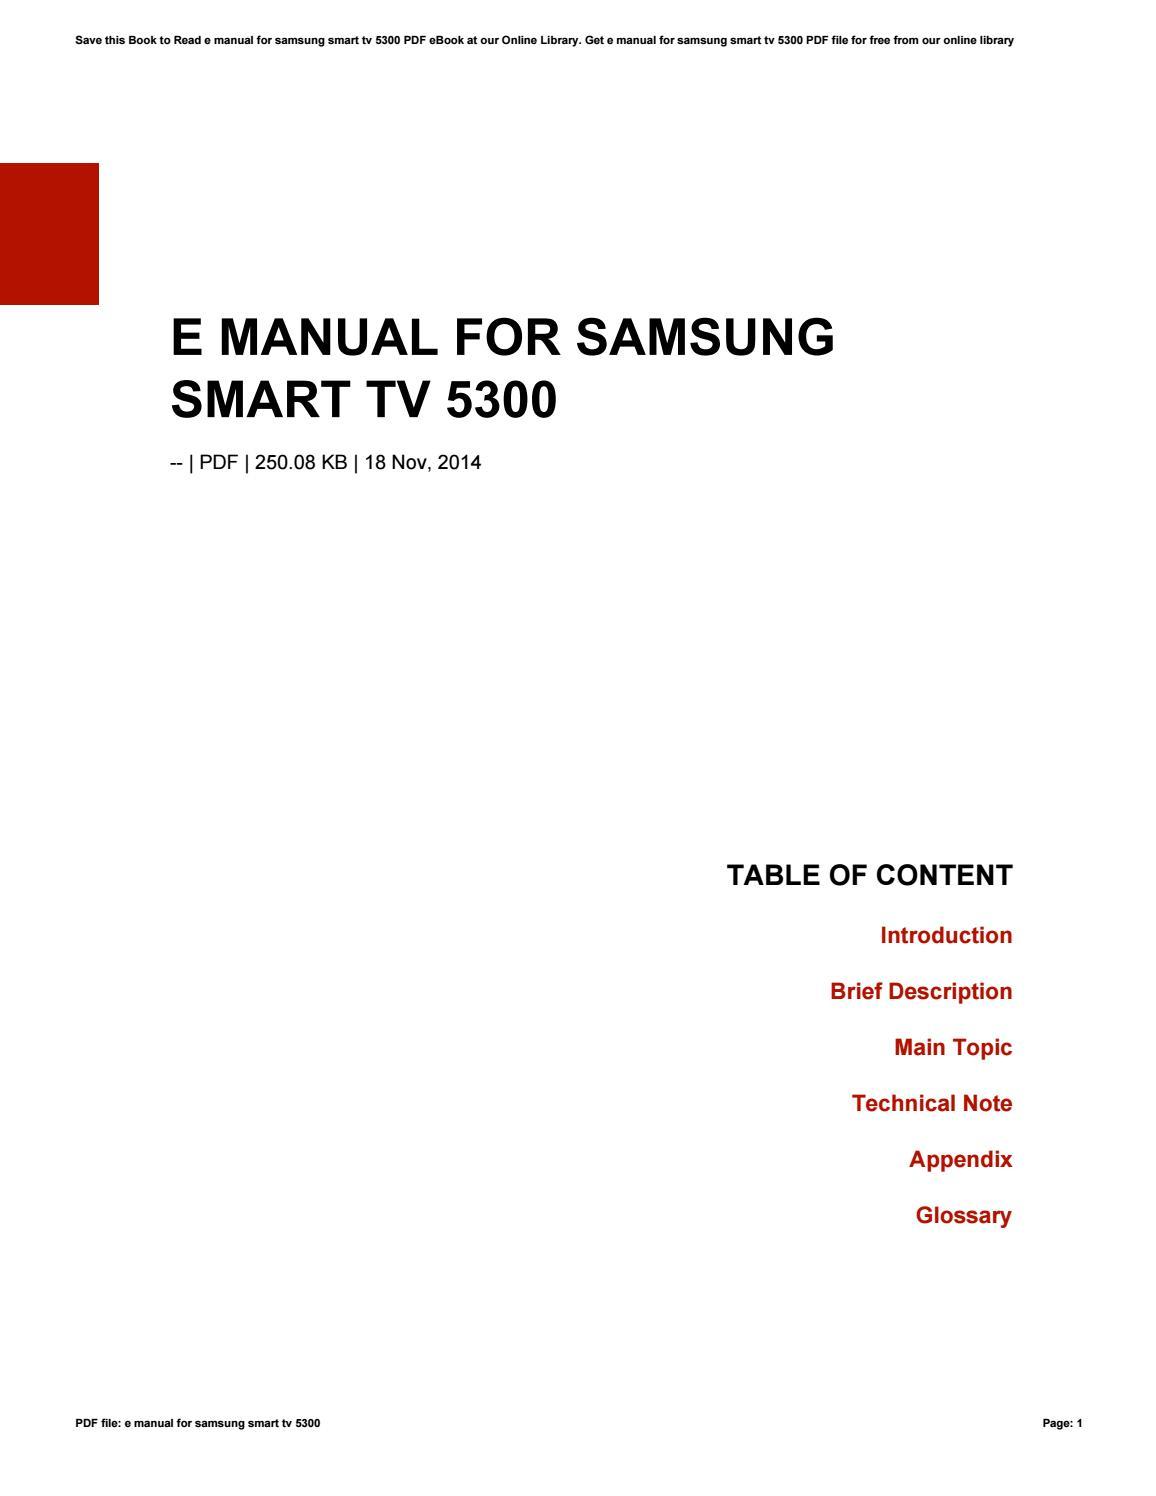 56757bdb6cef1 hseries jpg array - e manual for samsung smart tv 5300 by  i5606 issuu rh issuu